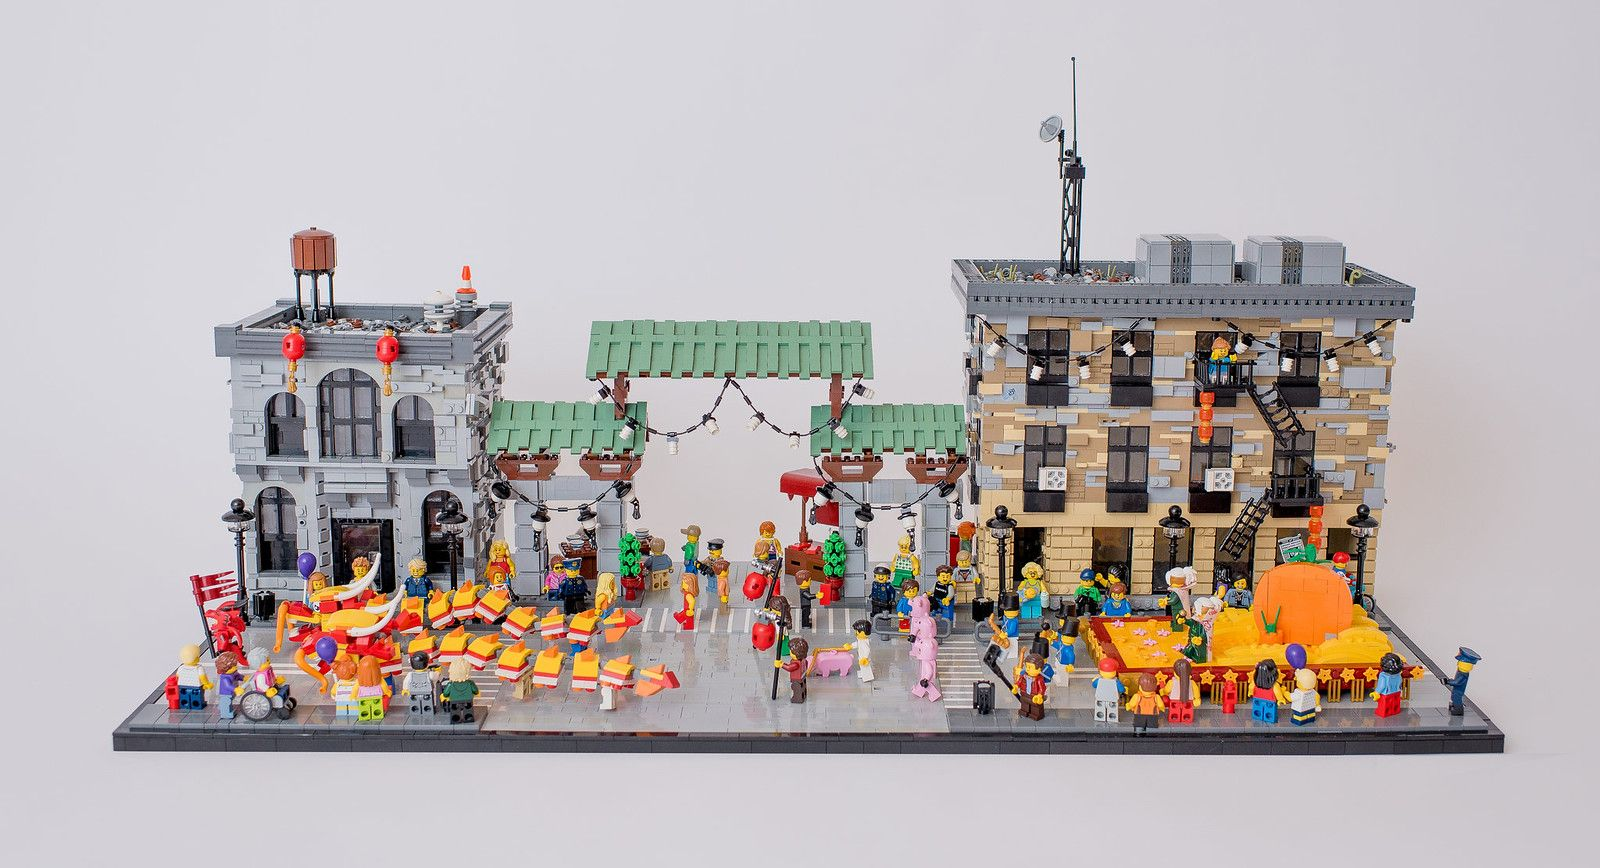 Chinese Lunar New Year San Fransisco Dragon Gate Lego